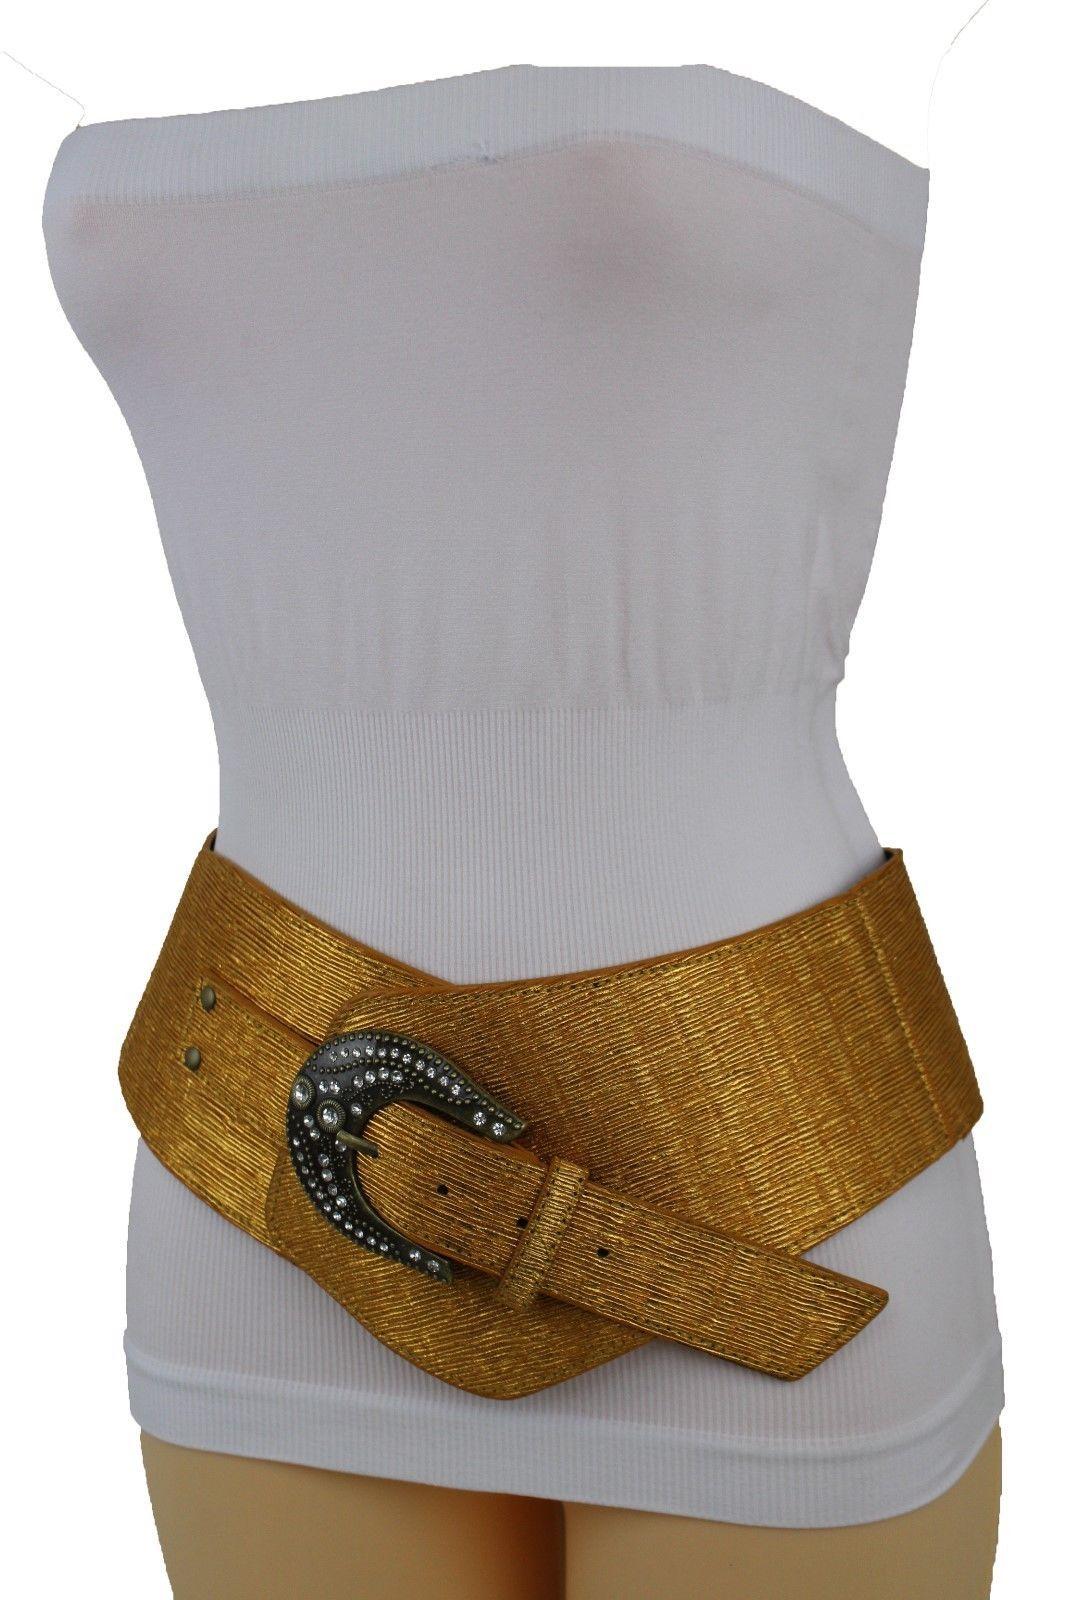 Women Silver Metal Buckles Narrow Fashion Belt Hip Waist Metallic Pink Size S M